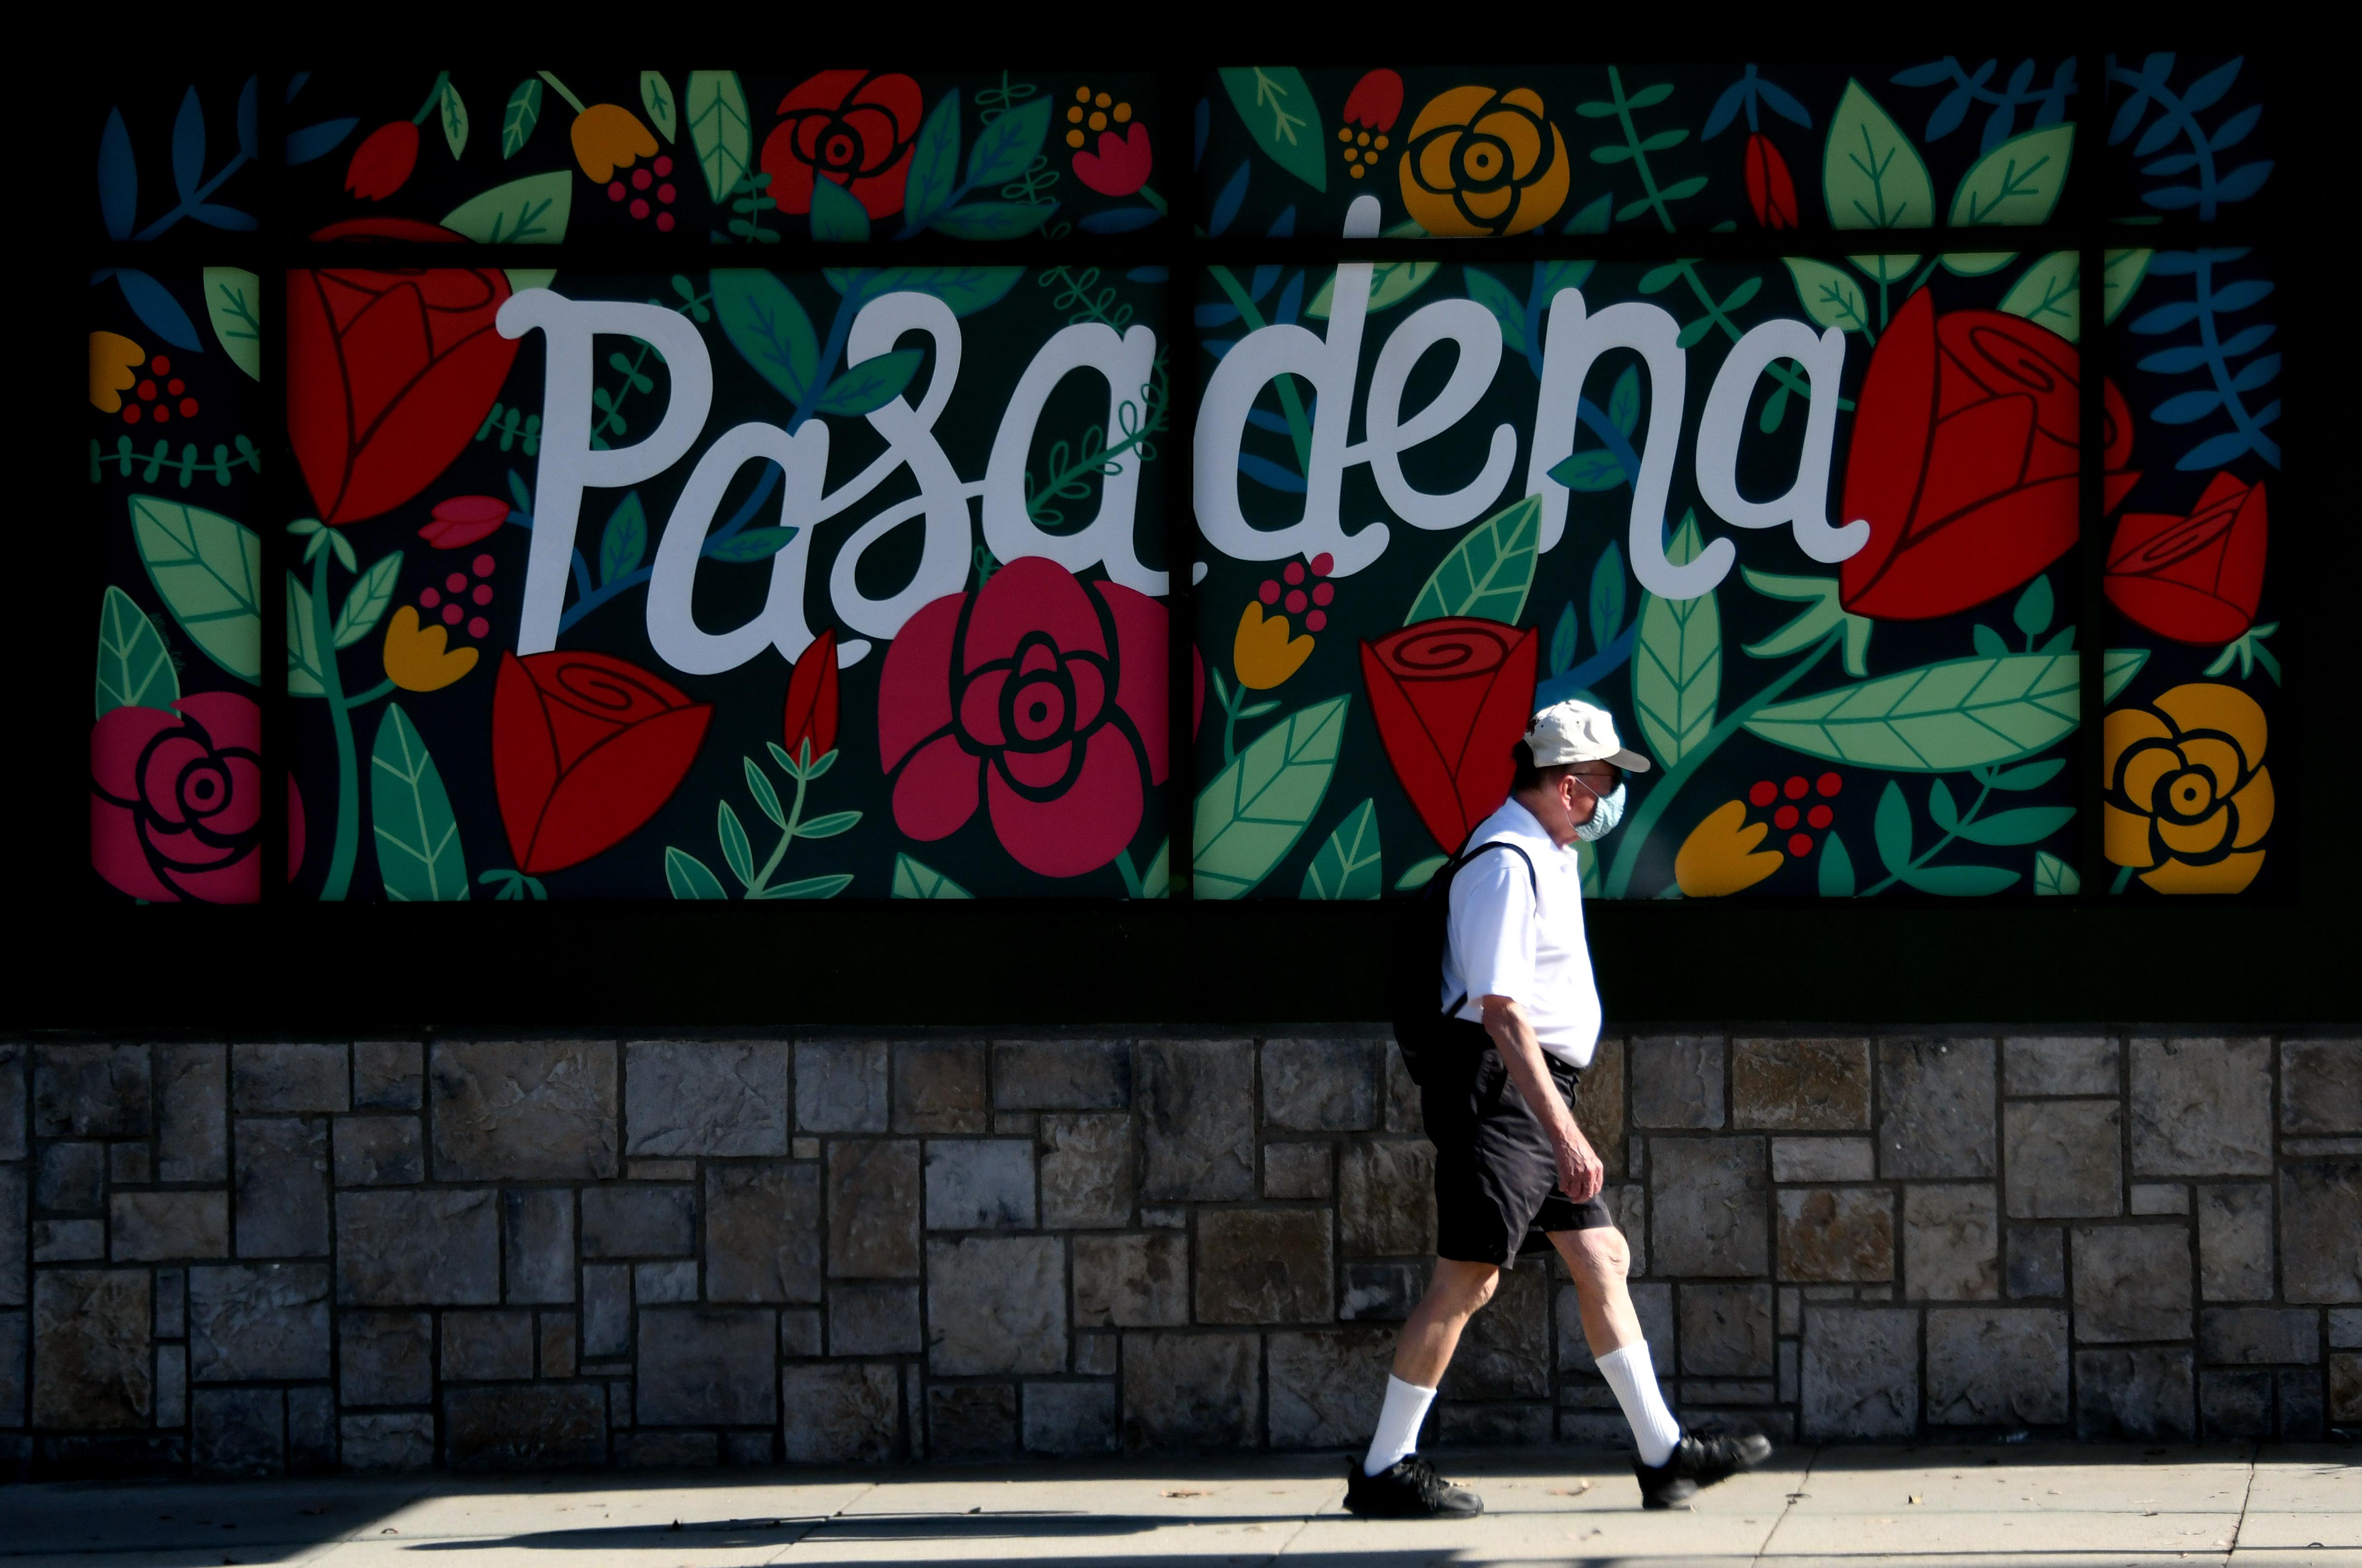 Pasadena during the Coronavirus Pandemic.